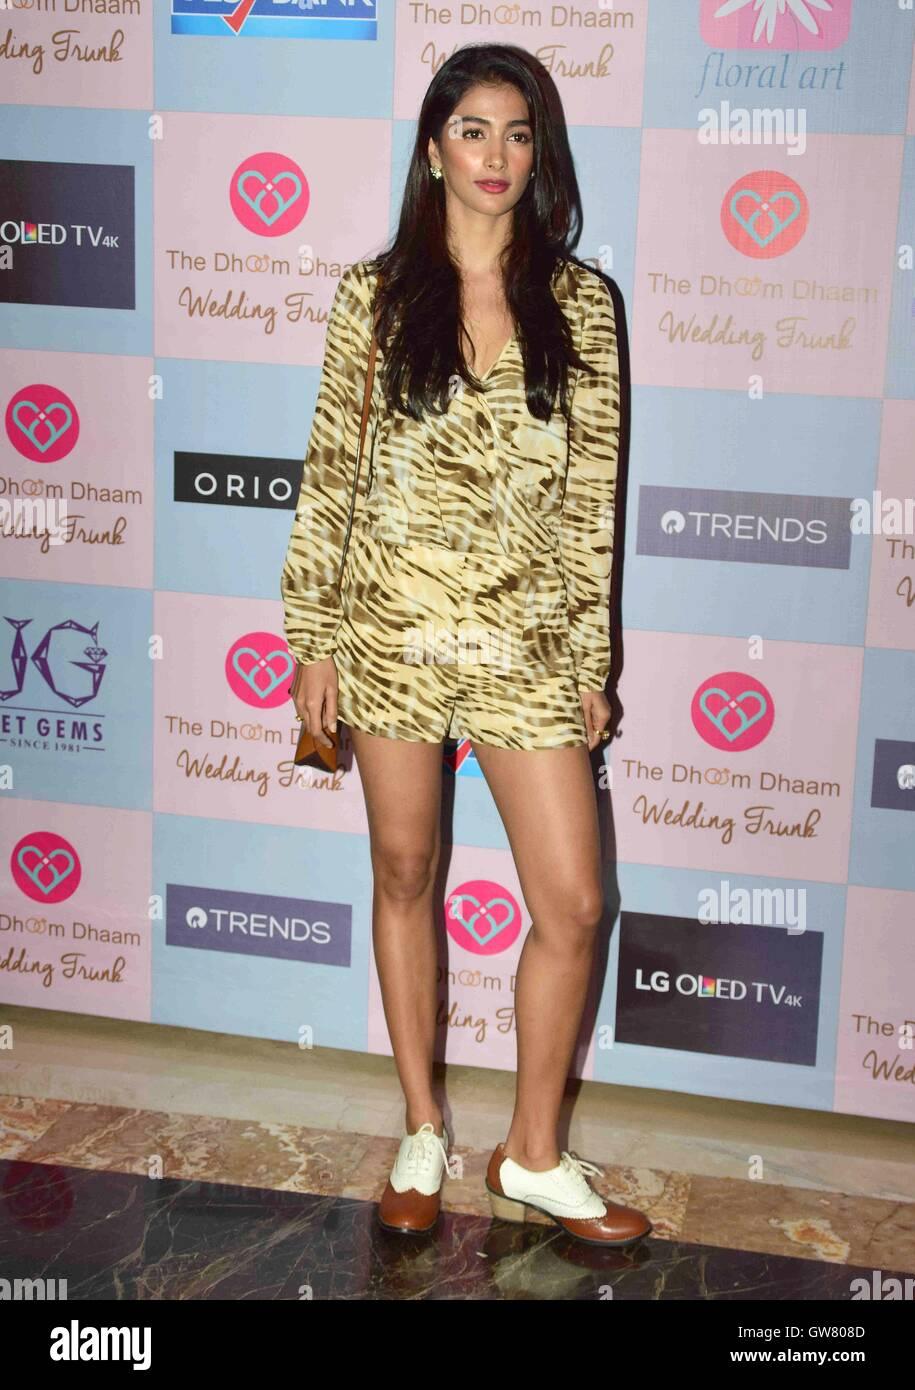 Attore di Bollywood Pooja Hegde durante il celebrity stylist, Tanya Ghavri's Dhoom Dhaam Wedding Trunk Show, Immagini Stock